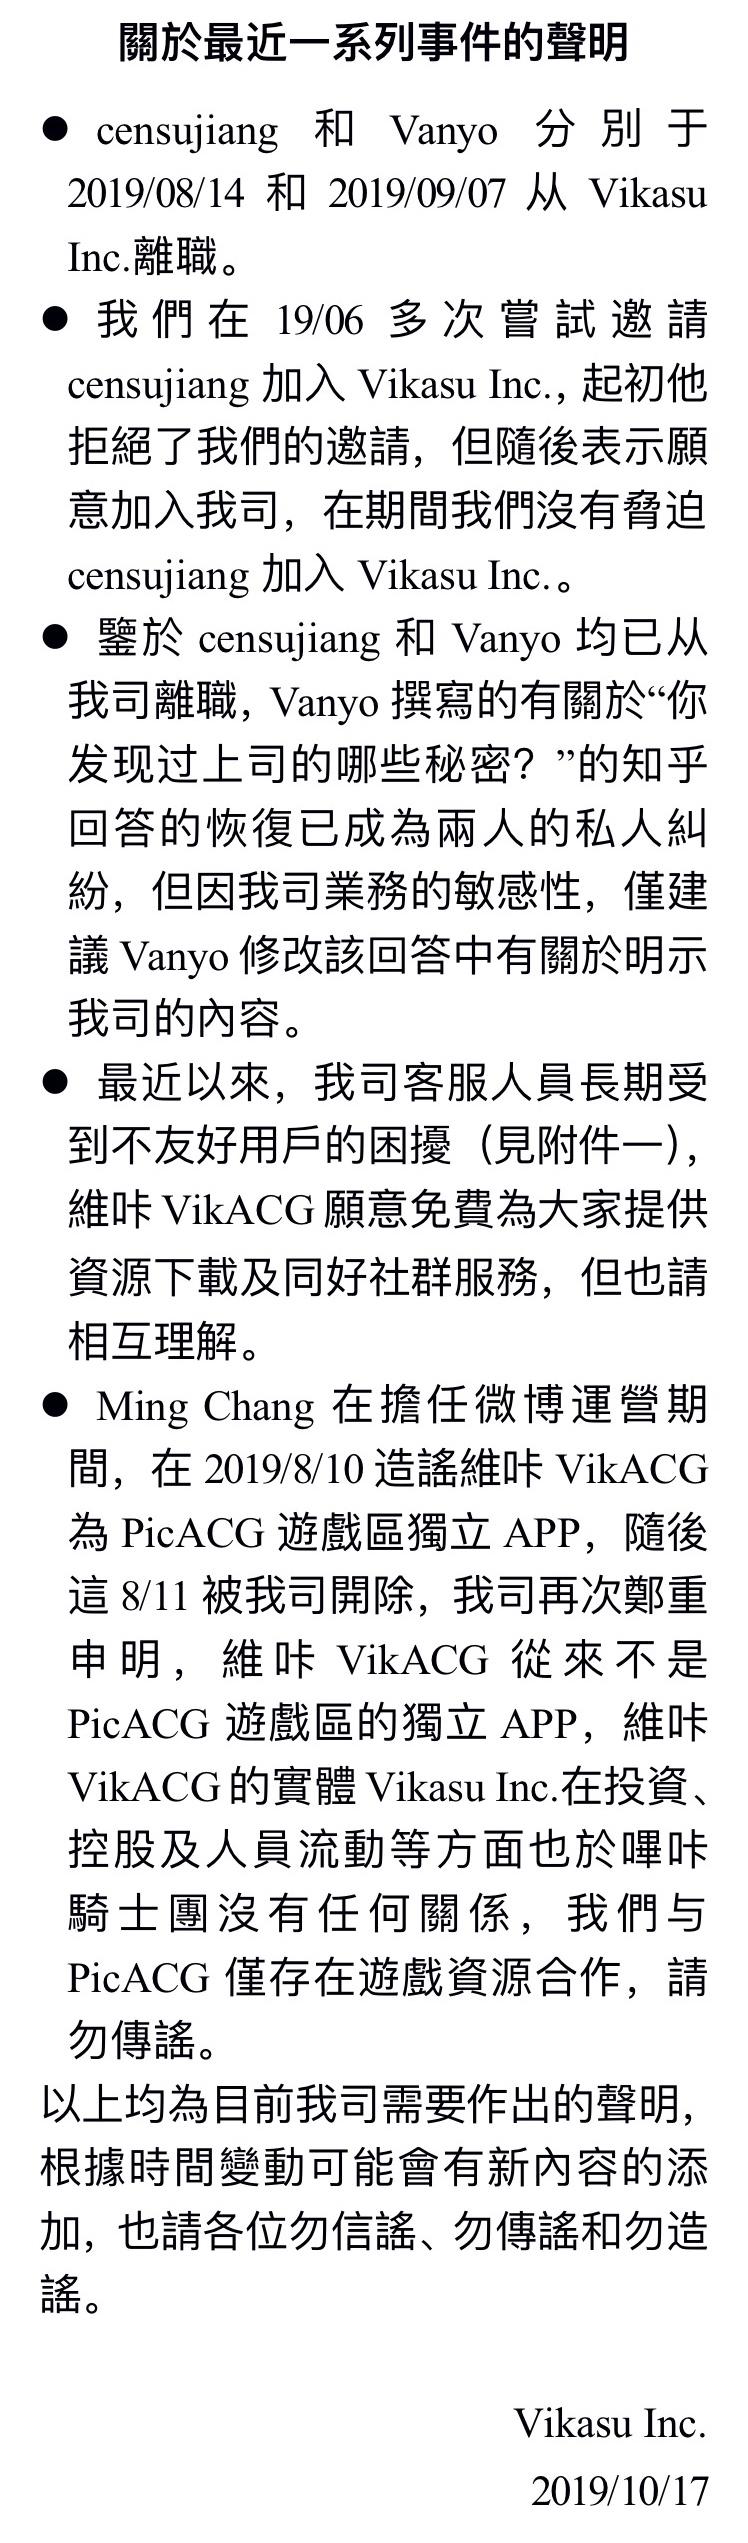 Vikasu Inc.(維咔VikACG)關於最近一系列事件的聲明